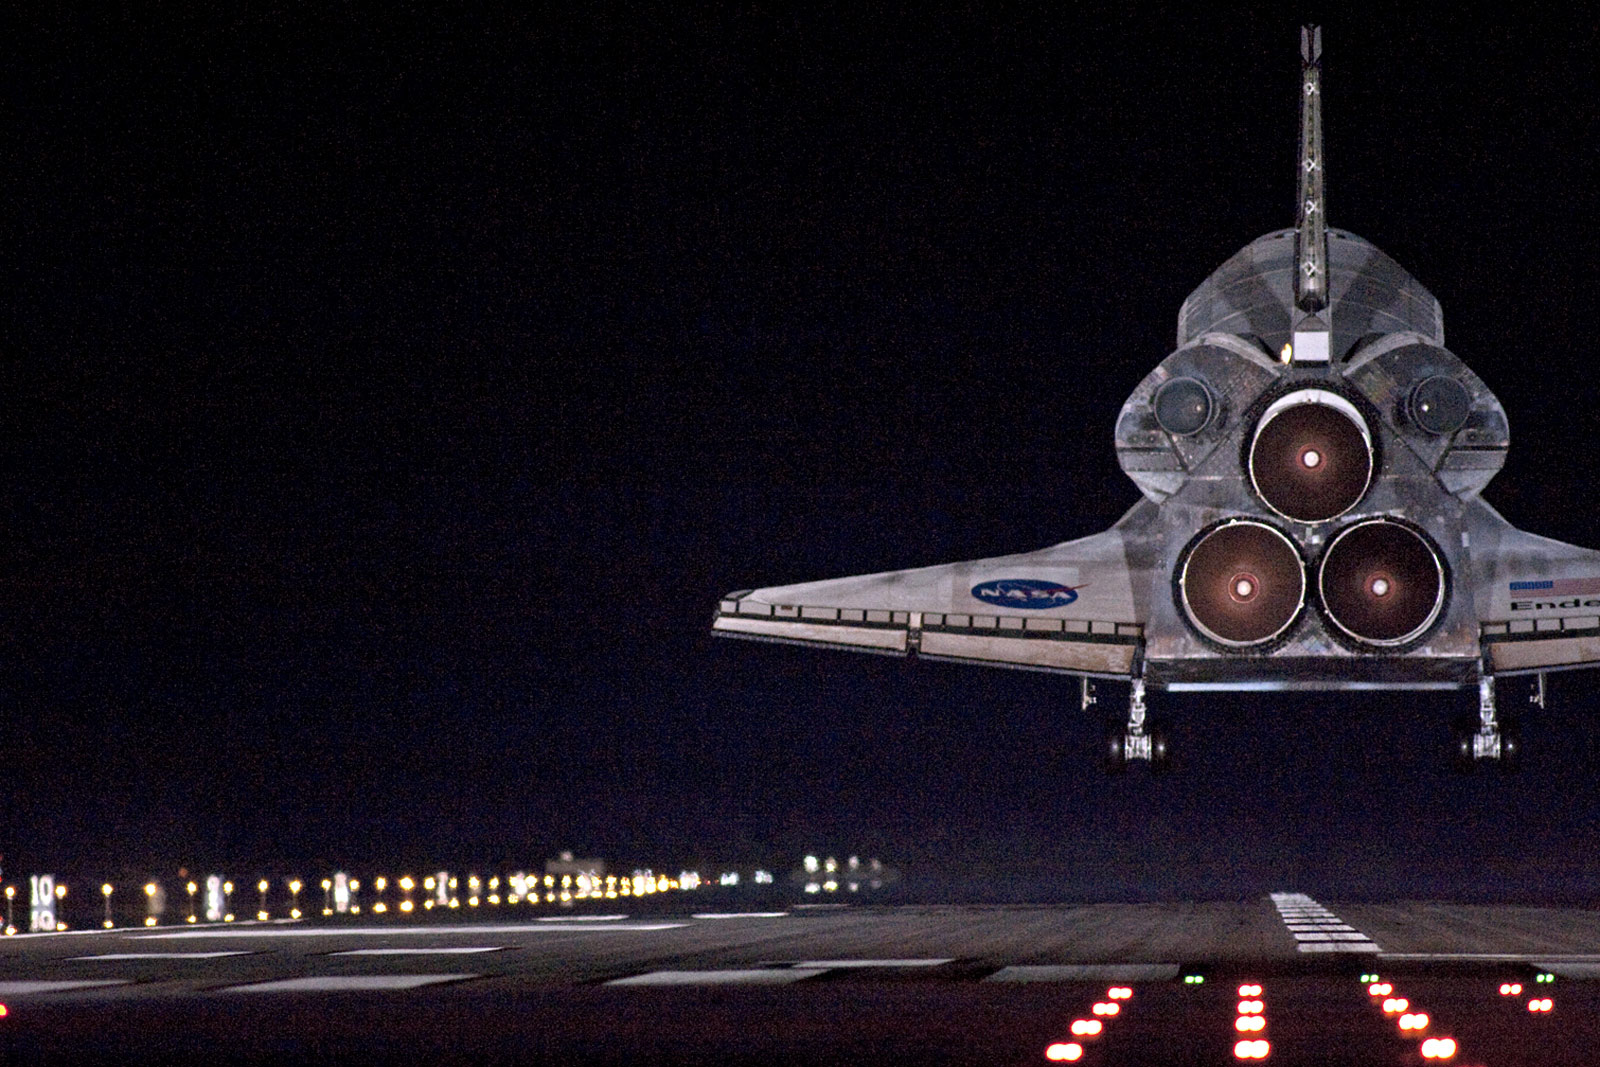 space shuttle landing at night - photo #36